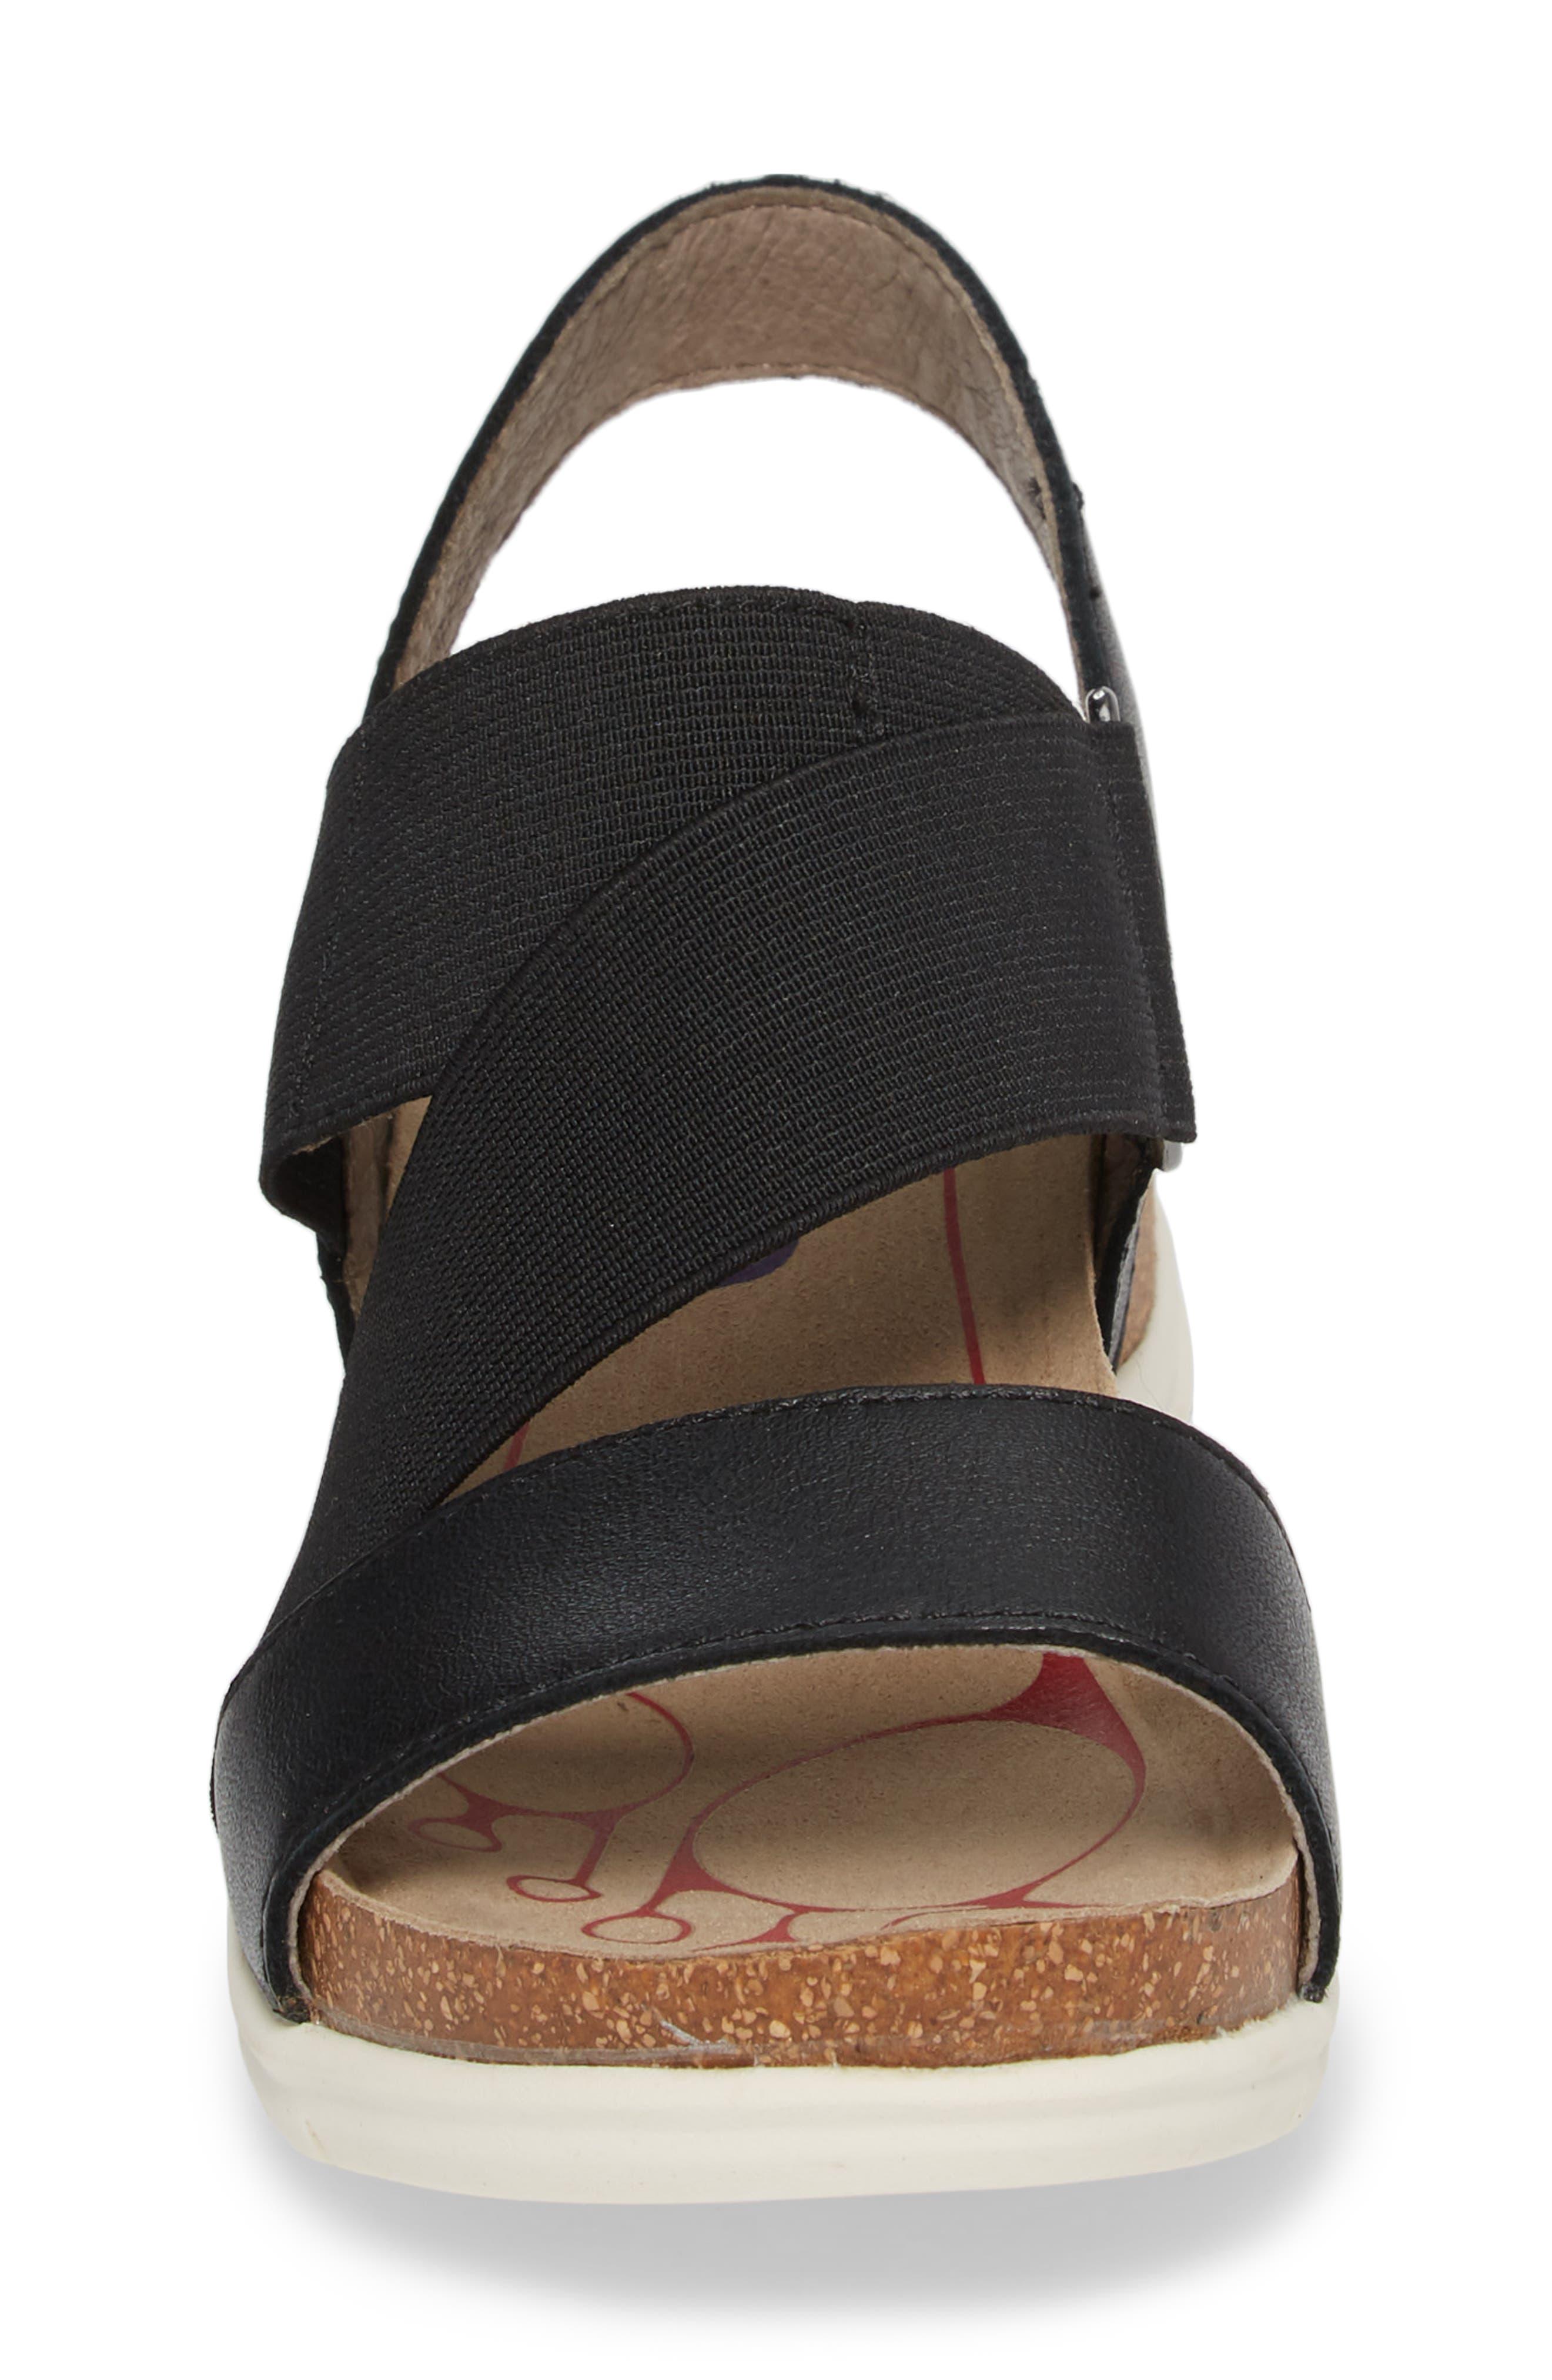 Paisley Wedge Sandal,                             Alternate thumbnail 4, color,                             001